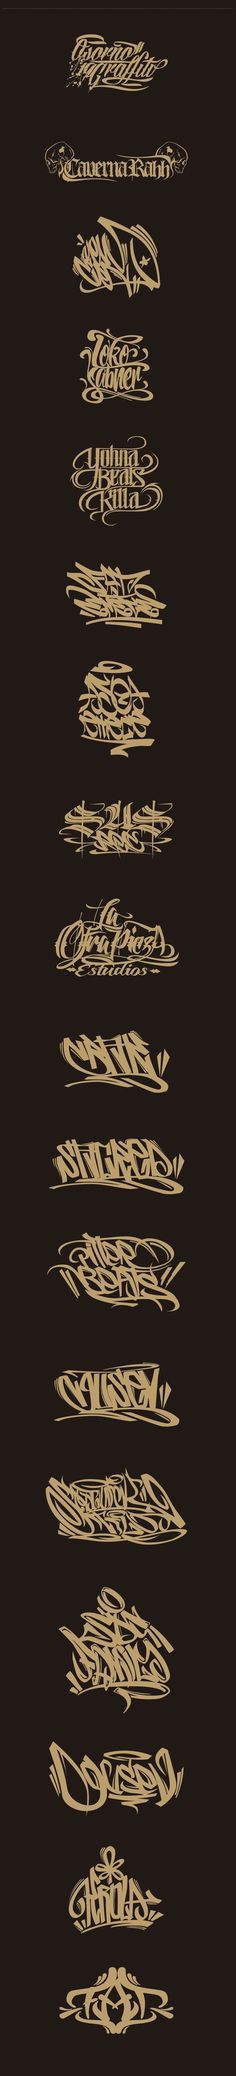 Lettering, Logos, Graffiti by Jorge Canicura, via Behance